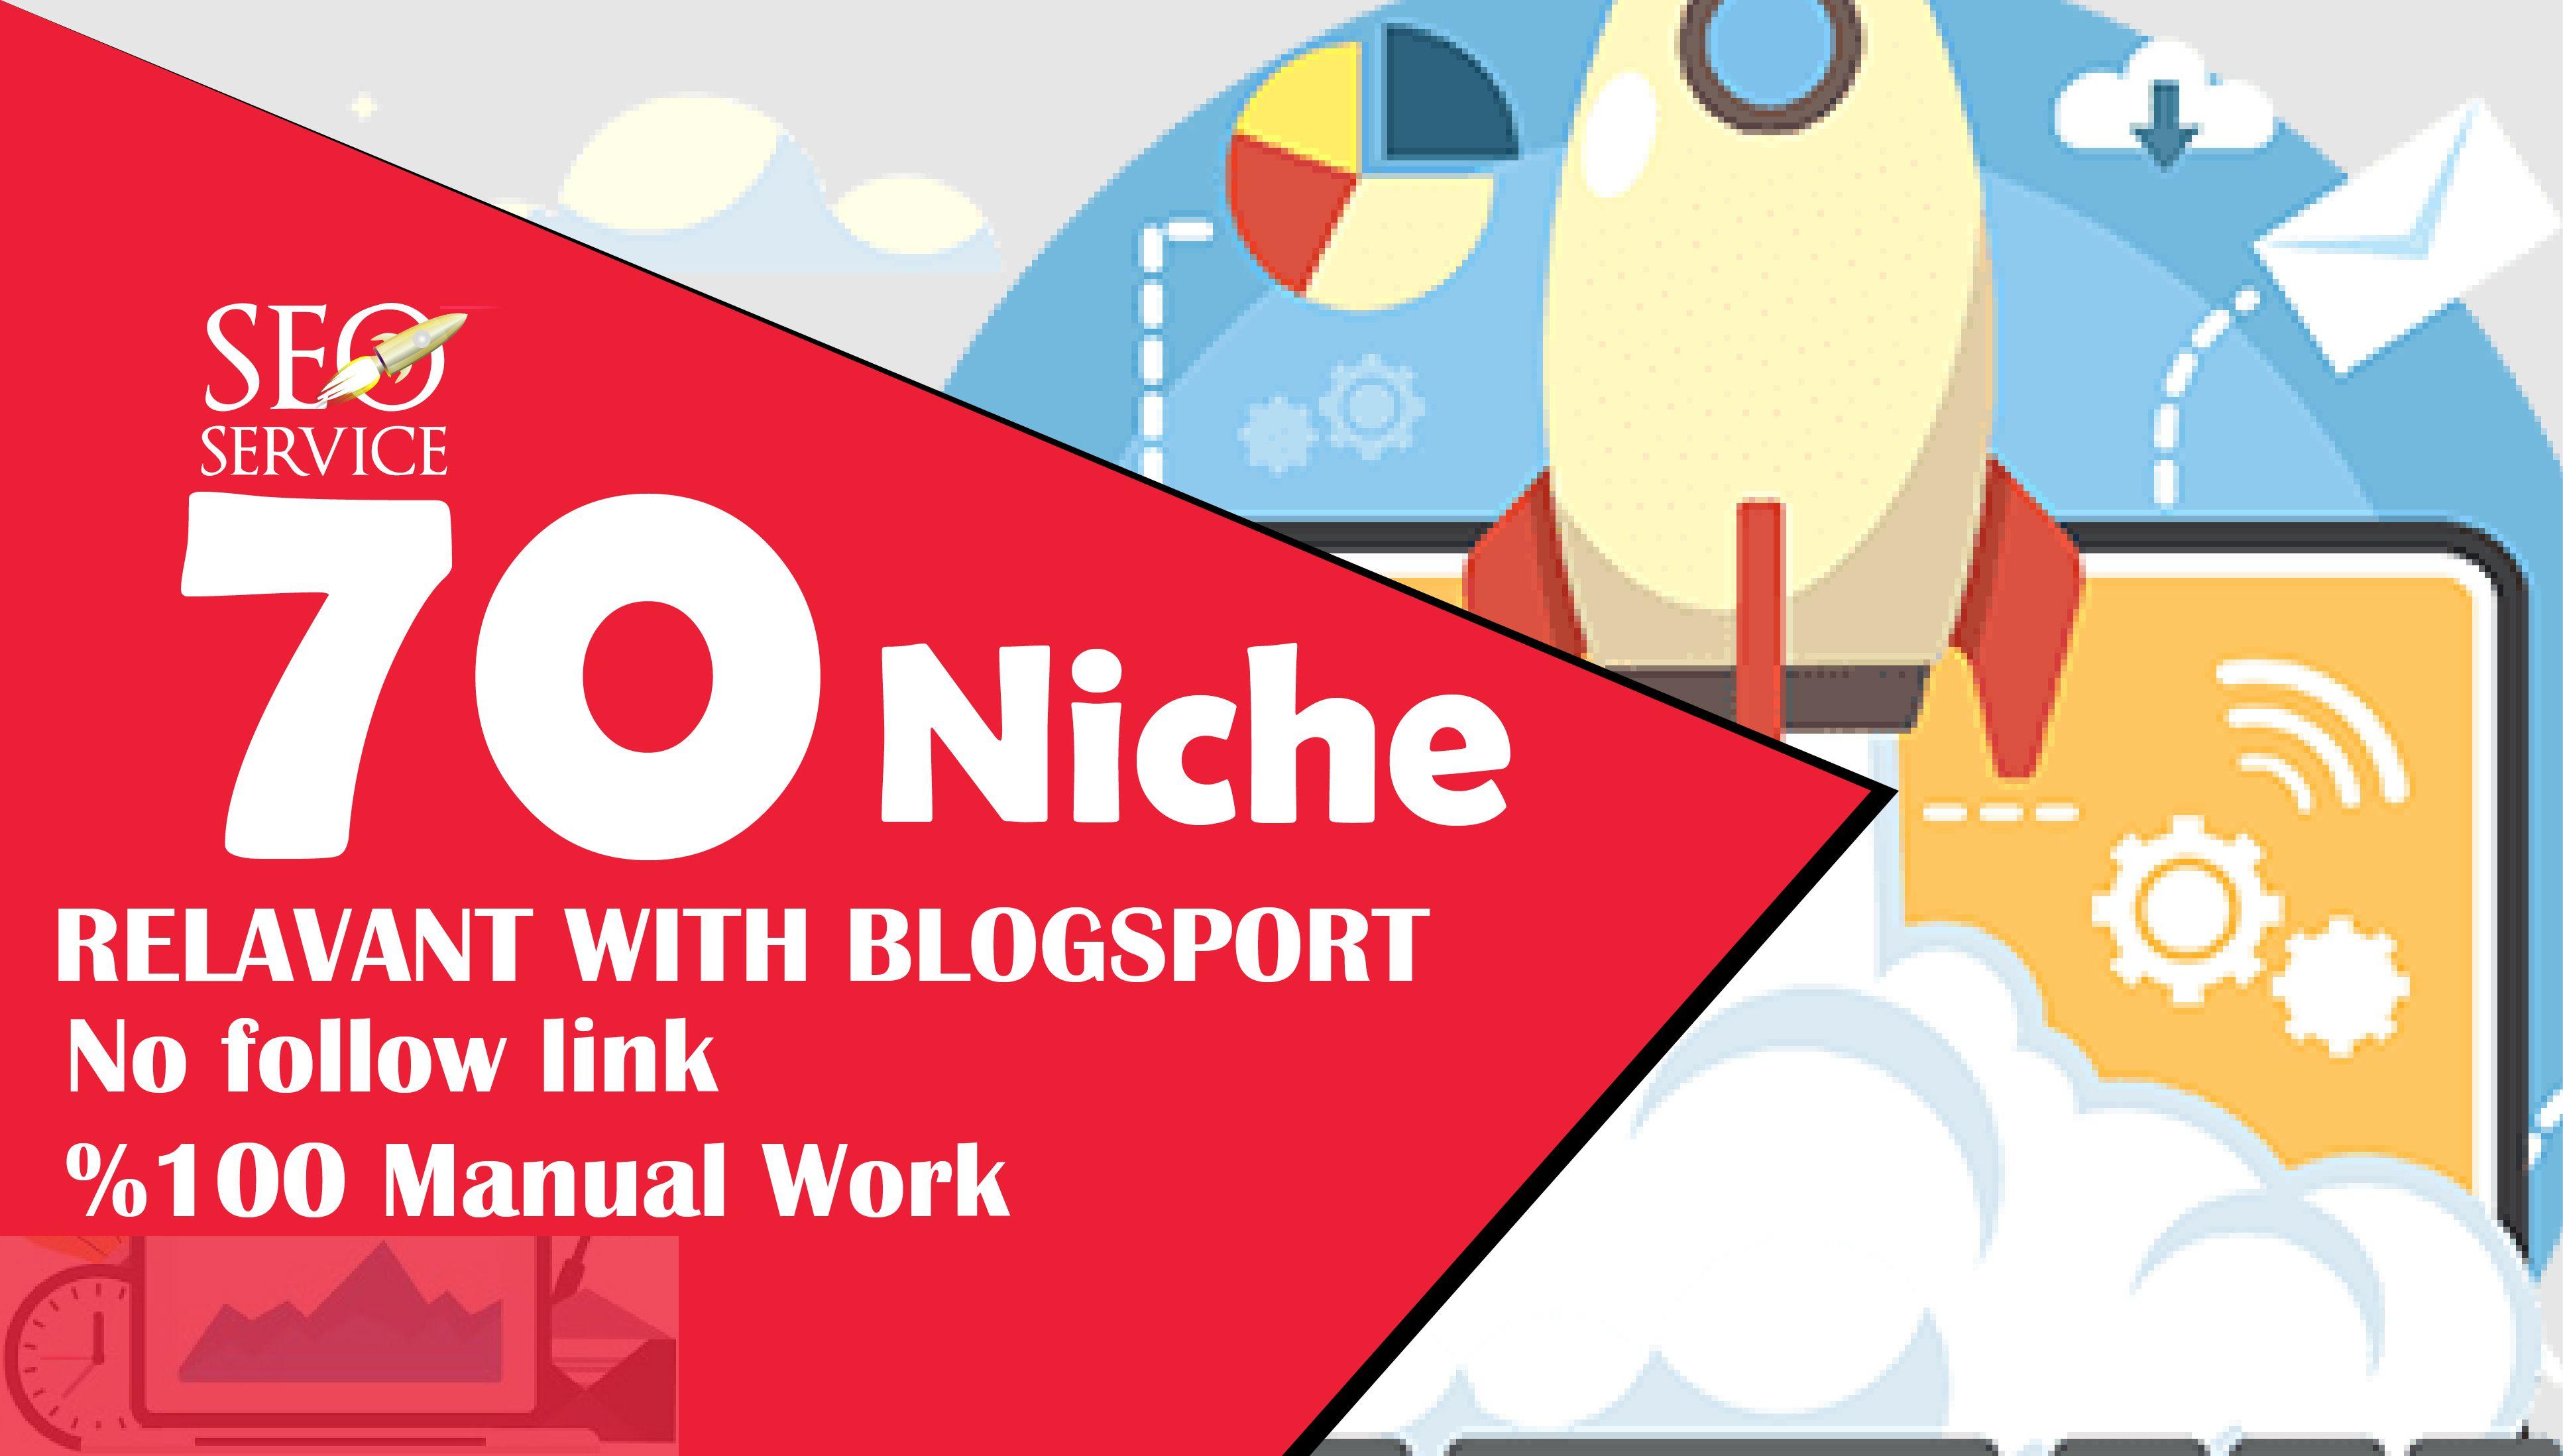 do 70 niche relevant blog comment backlinks low OBL